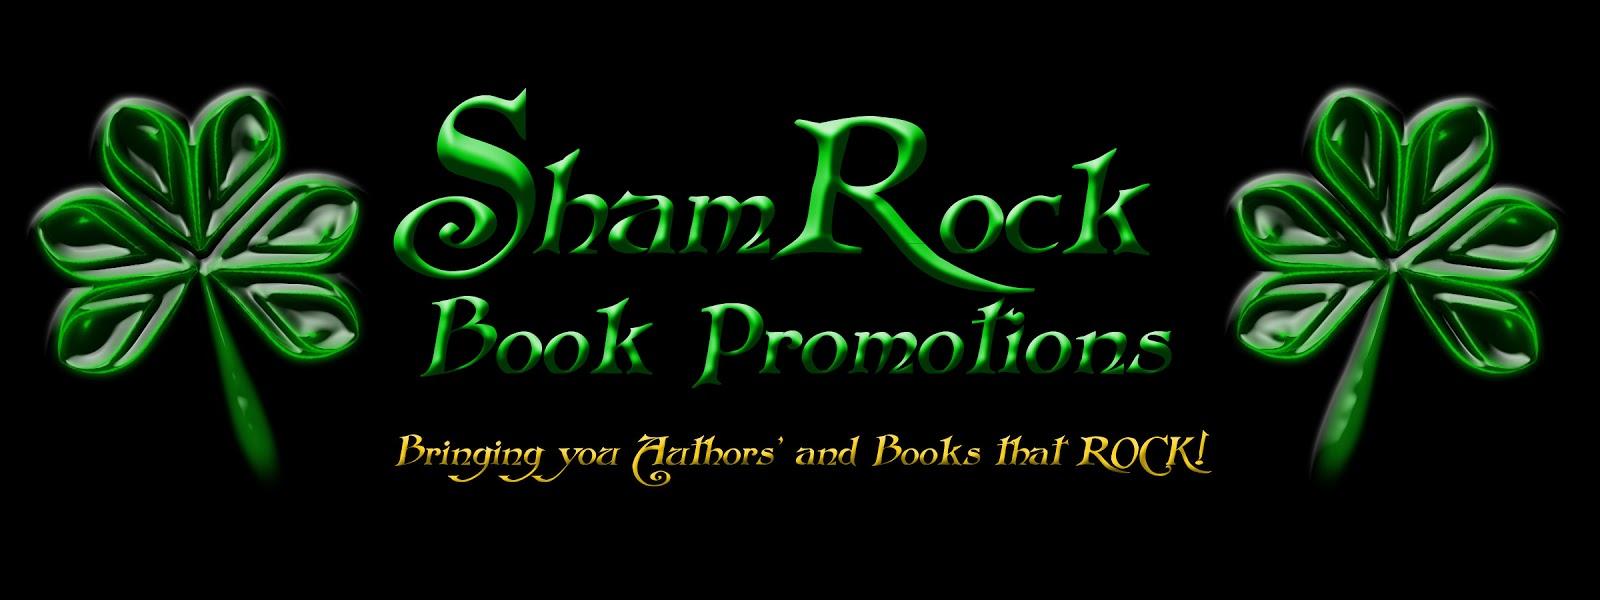 http://shamrockauthorpr.wix.com/shamrockbookpromo